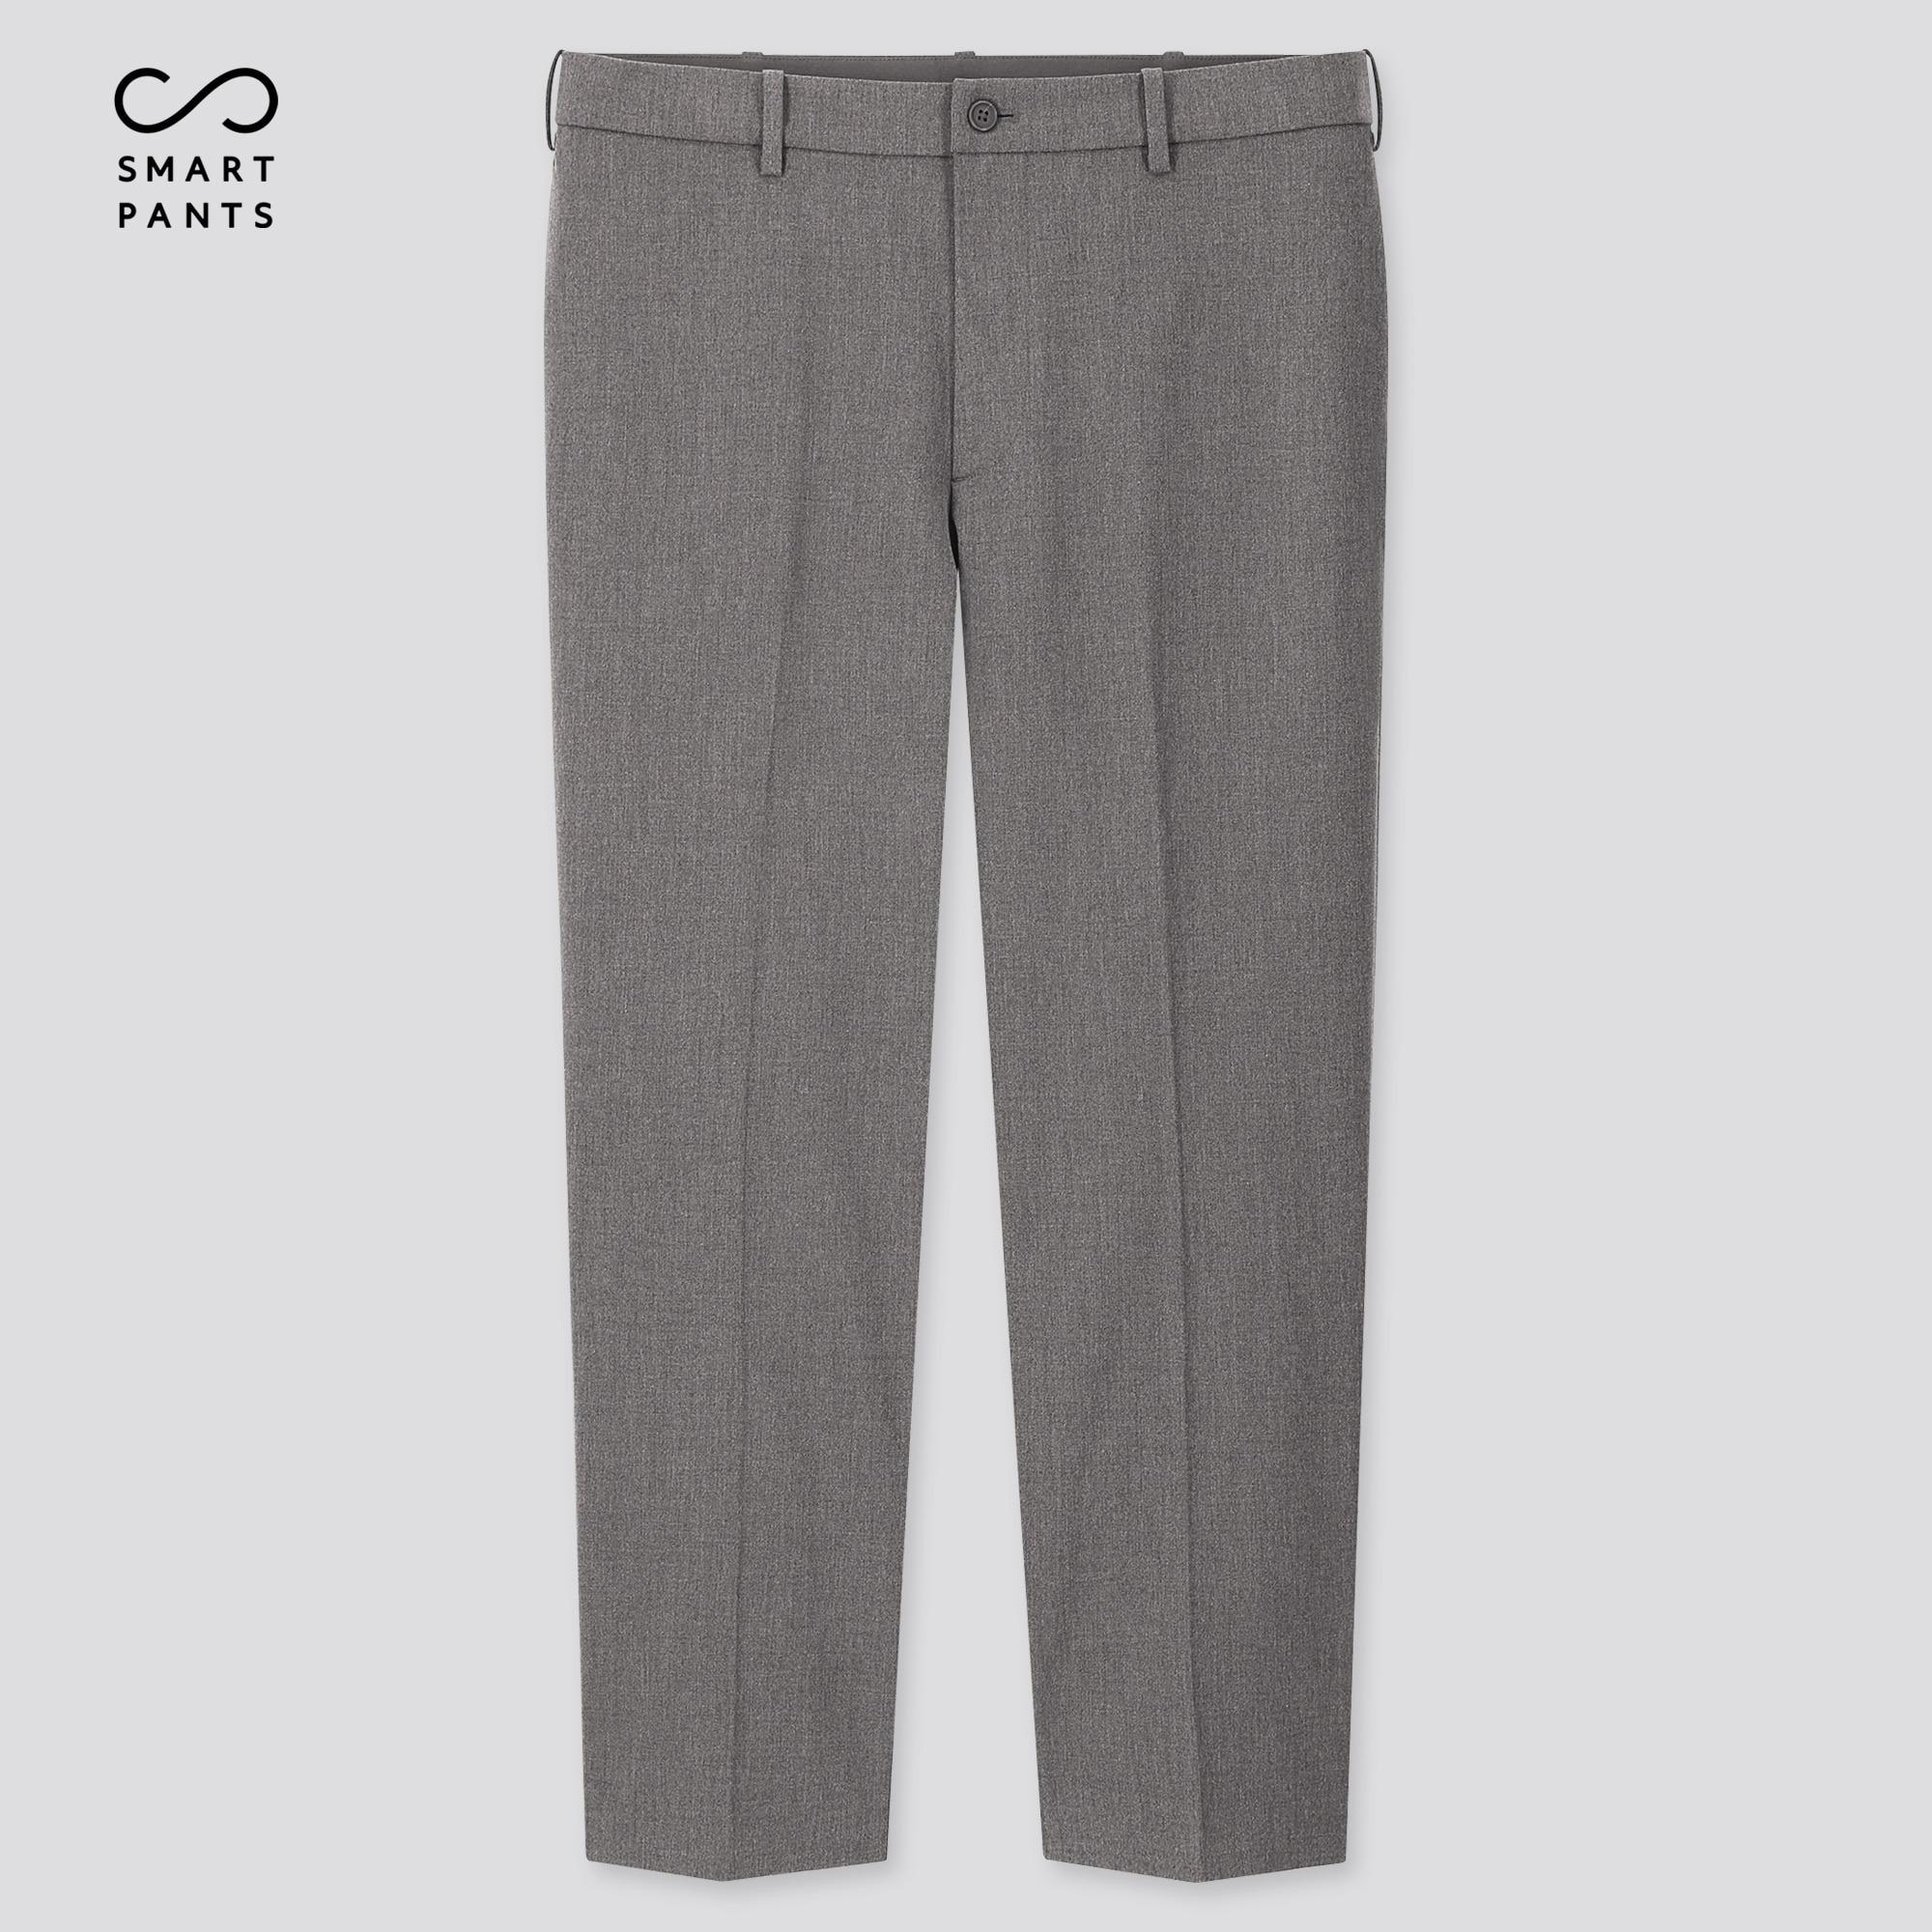 Uniqlo Men's Smart 2-Way Stretch Ankle-Length Pants